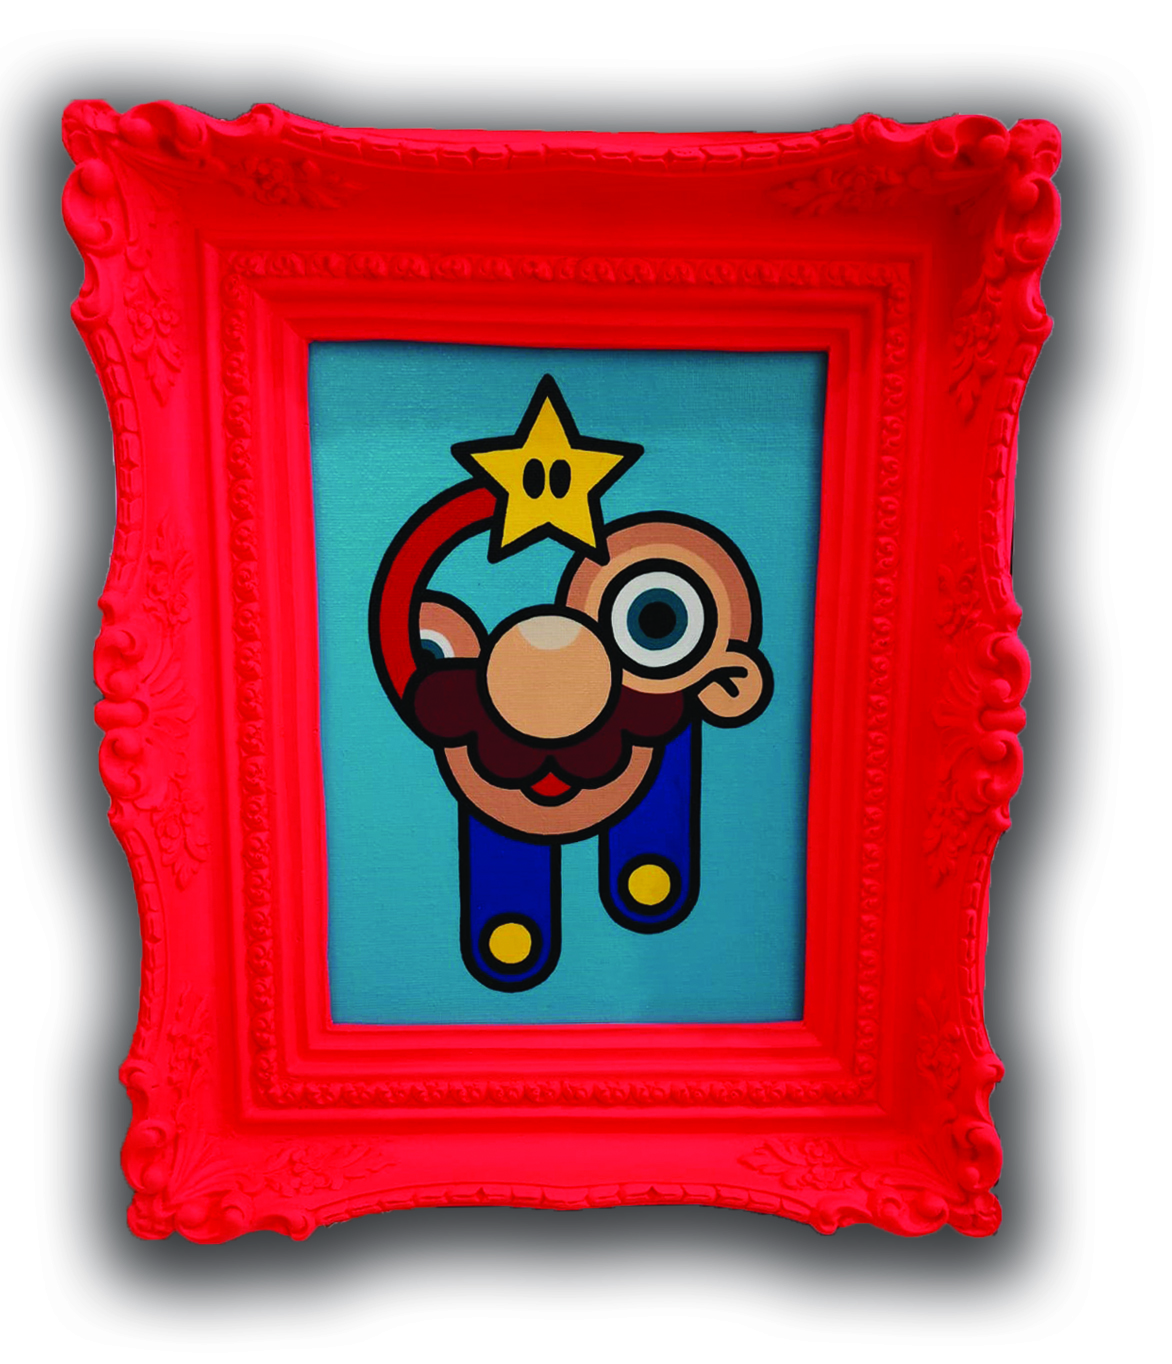 Cubic Mario